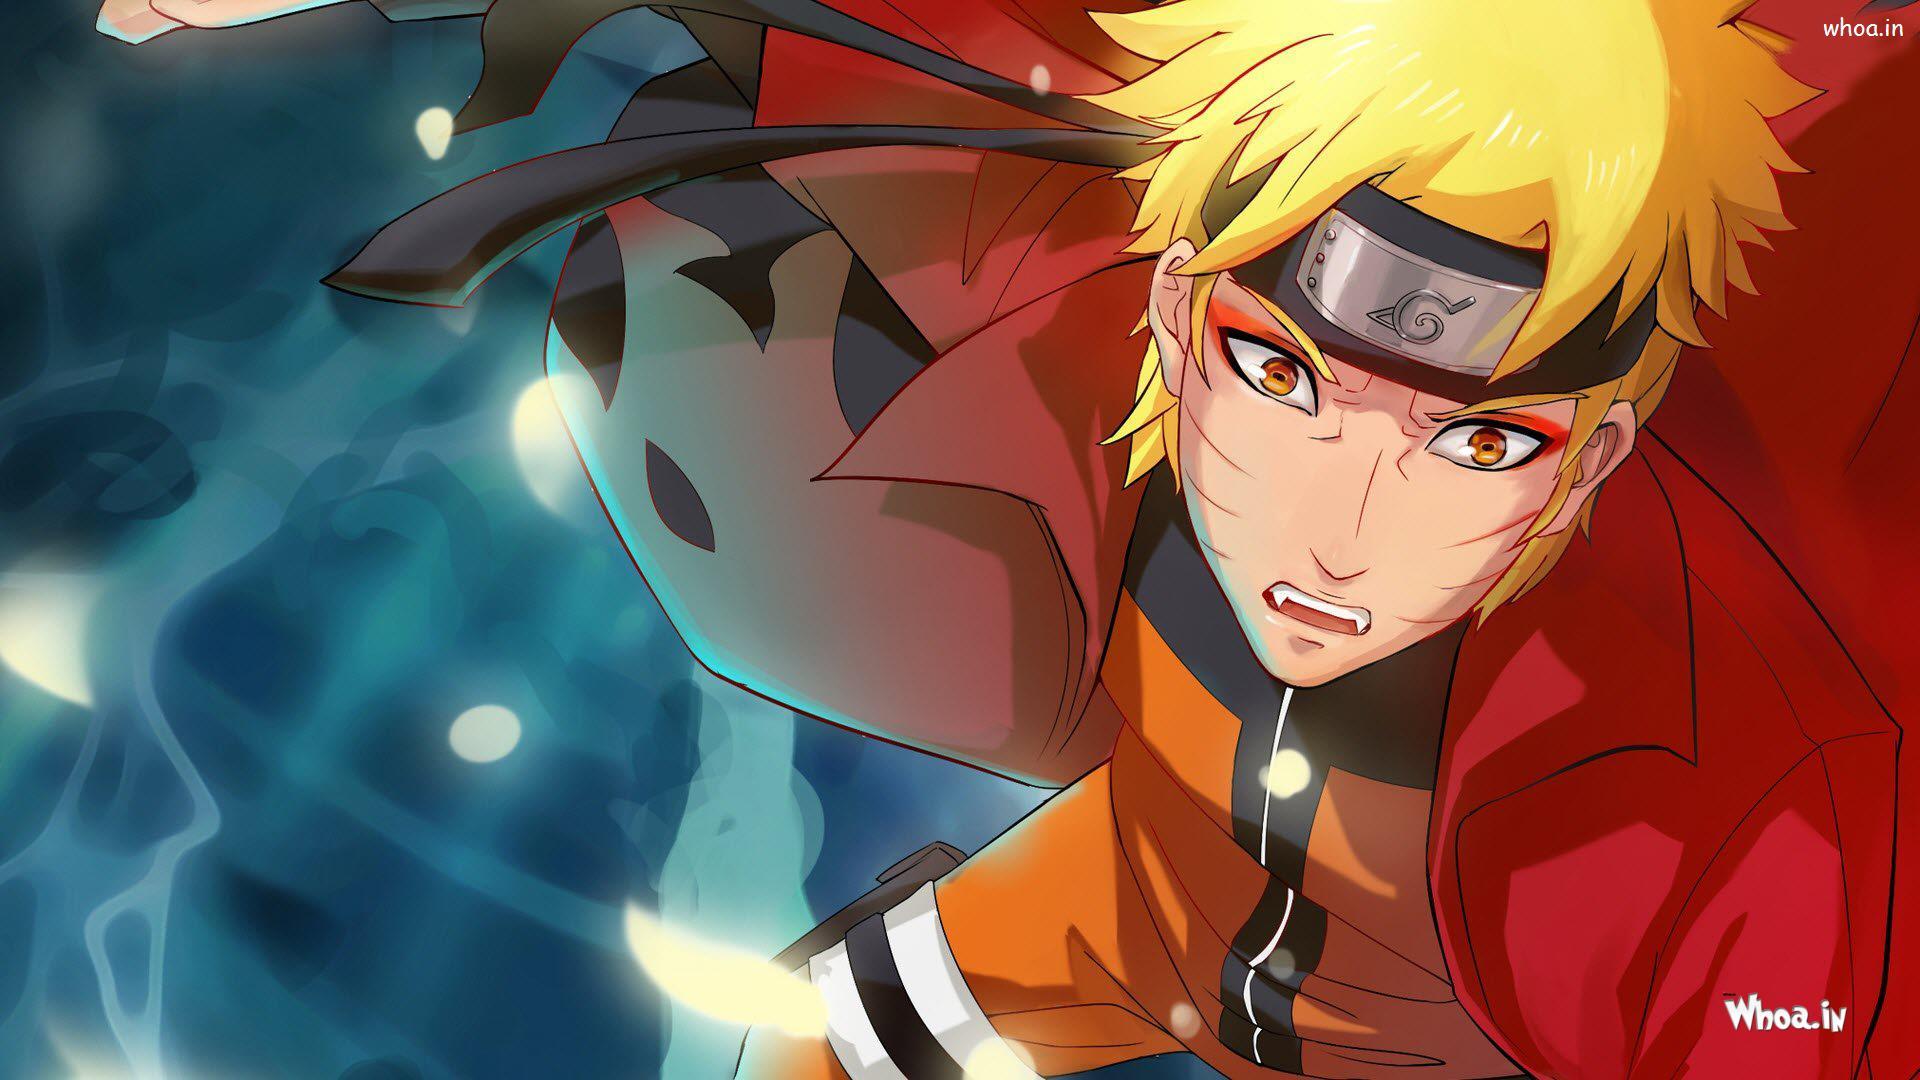 Popular Wallpaper Naruto Face - naruto-shippuden-face-closeup-hd-wallpaper  Image_732422.in/download/naruto-shippuden-face-closeup-hd-wallpaper